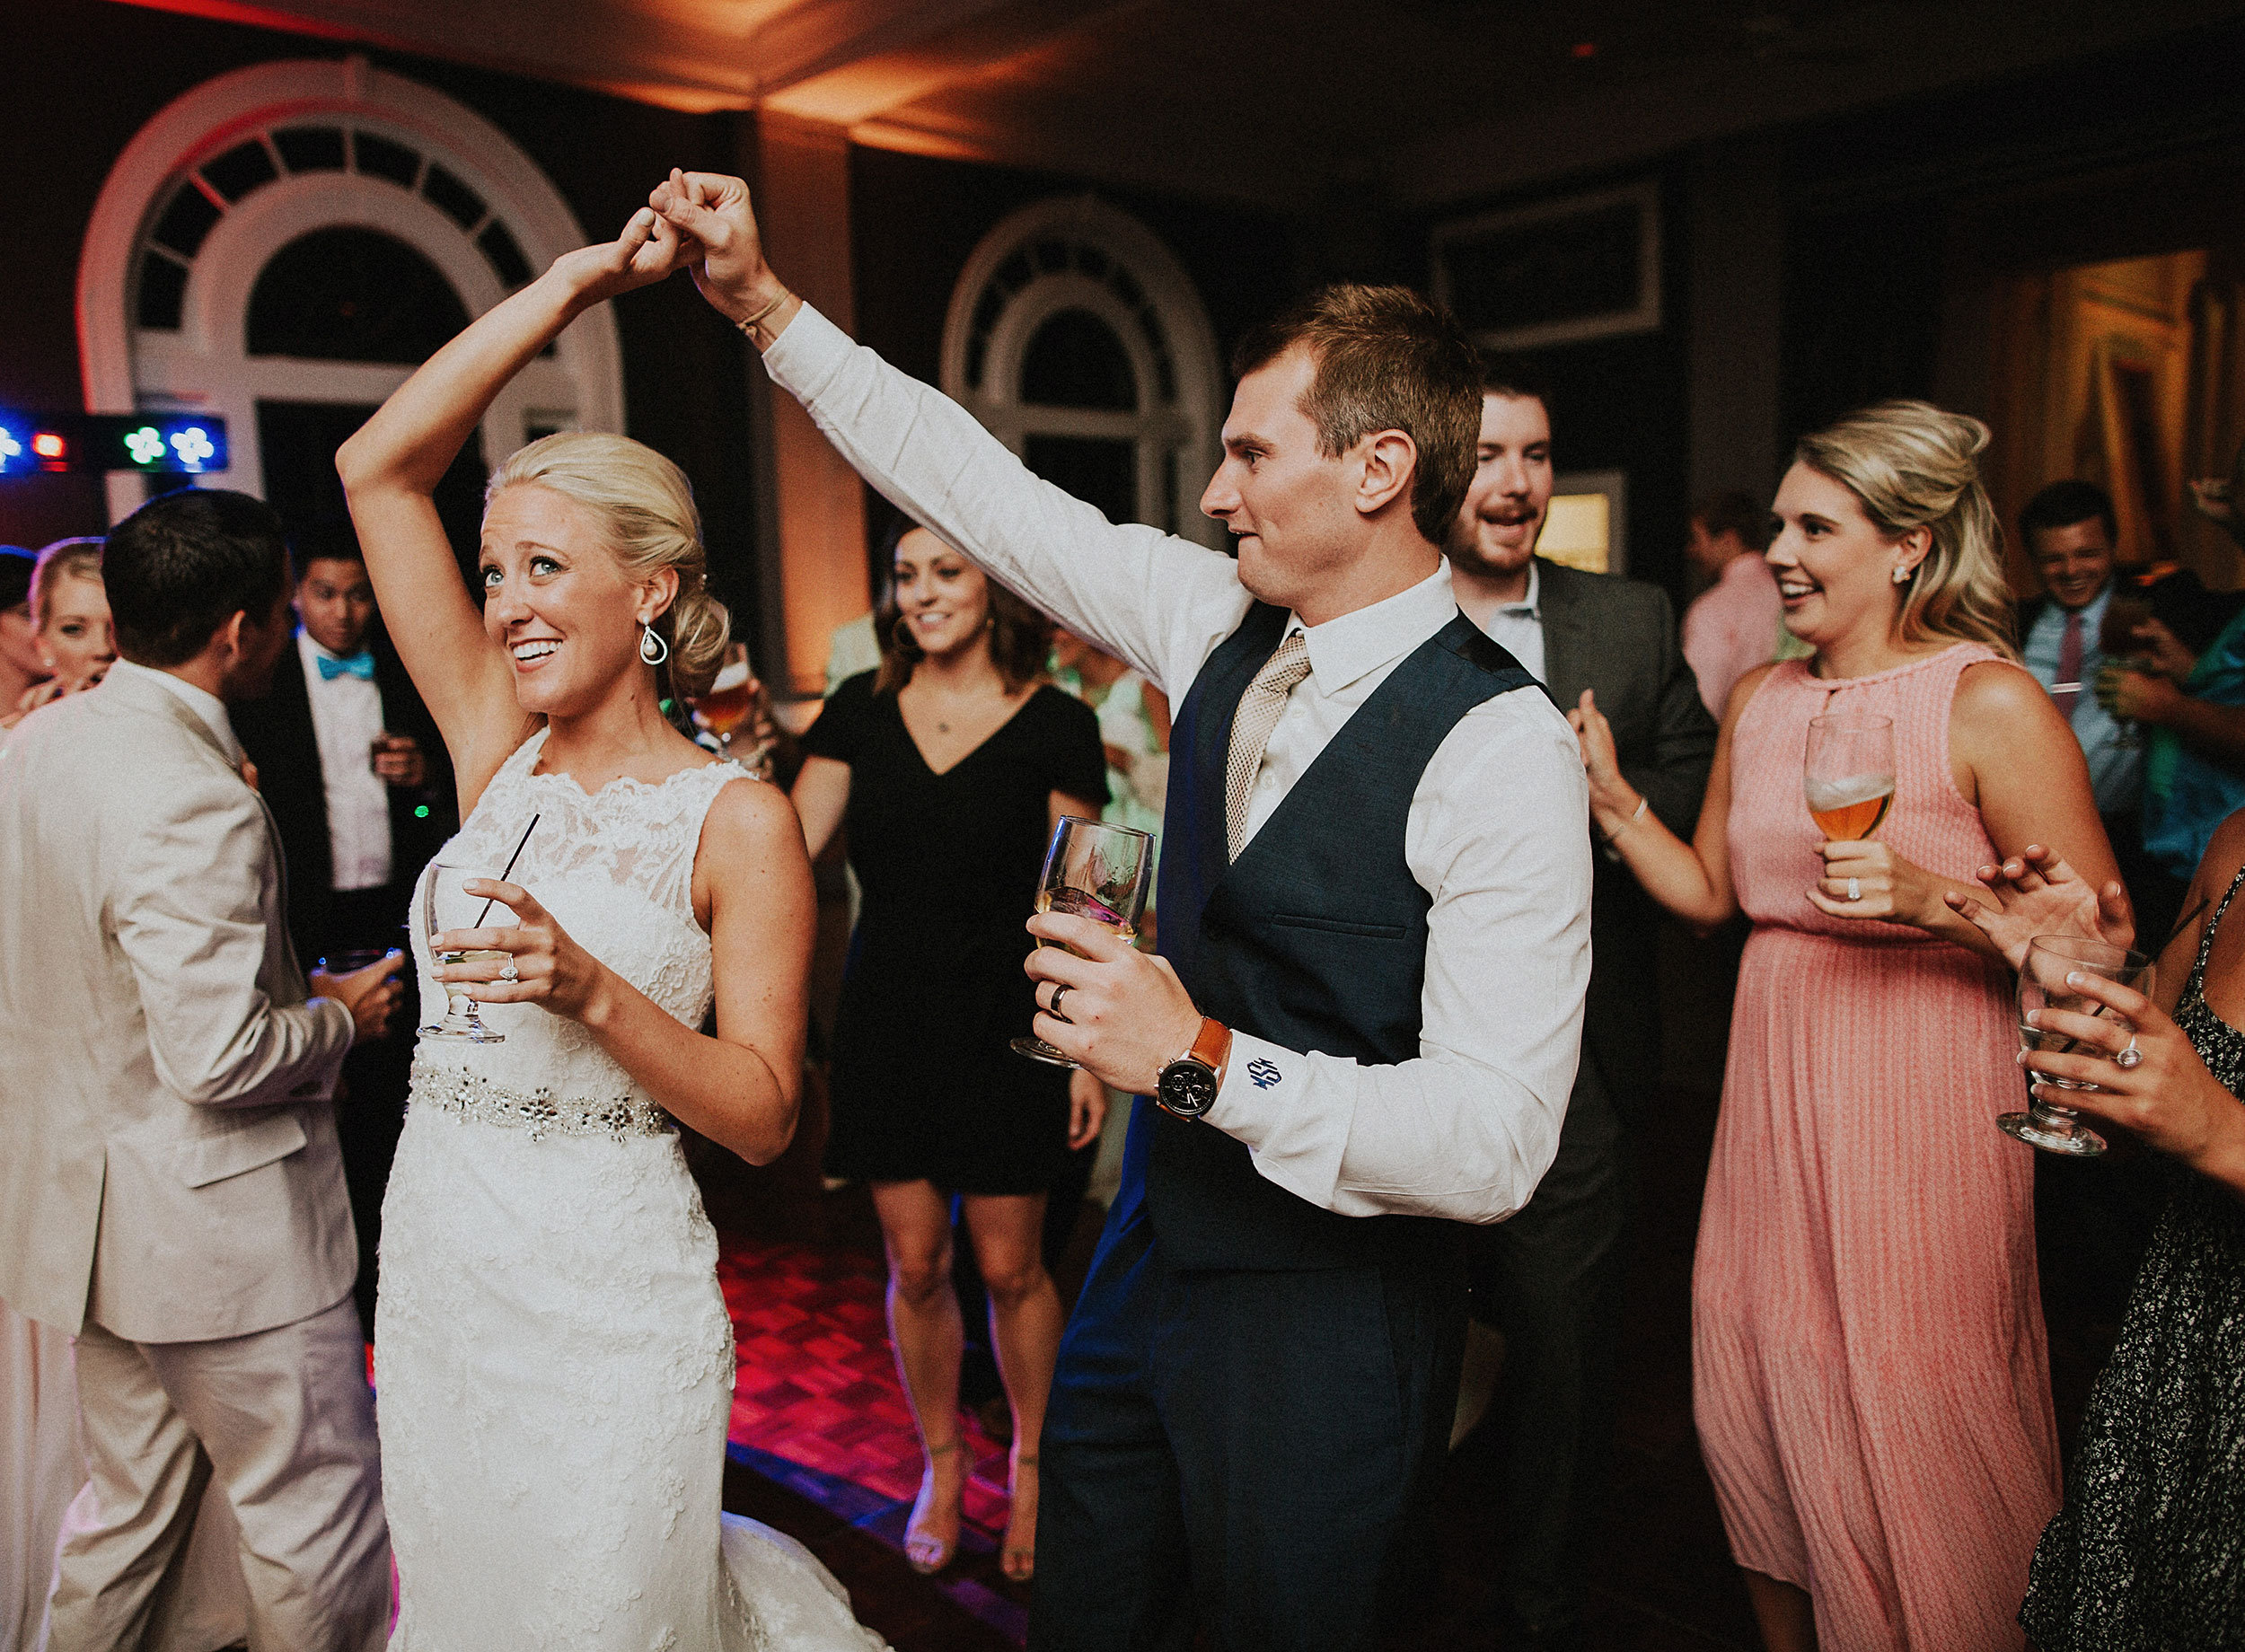 olmsted-wedding-louisville-kentucky-046.JPG